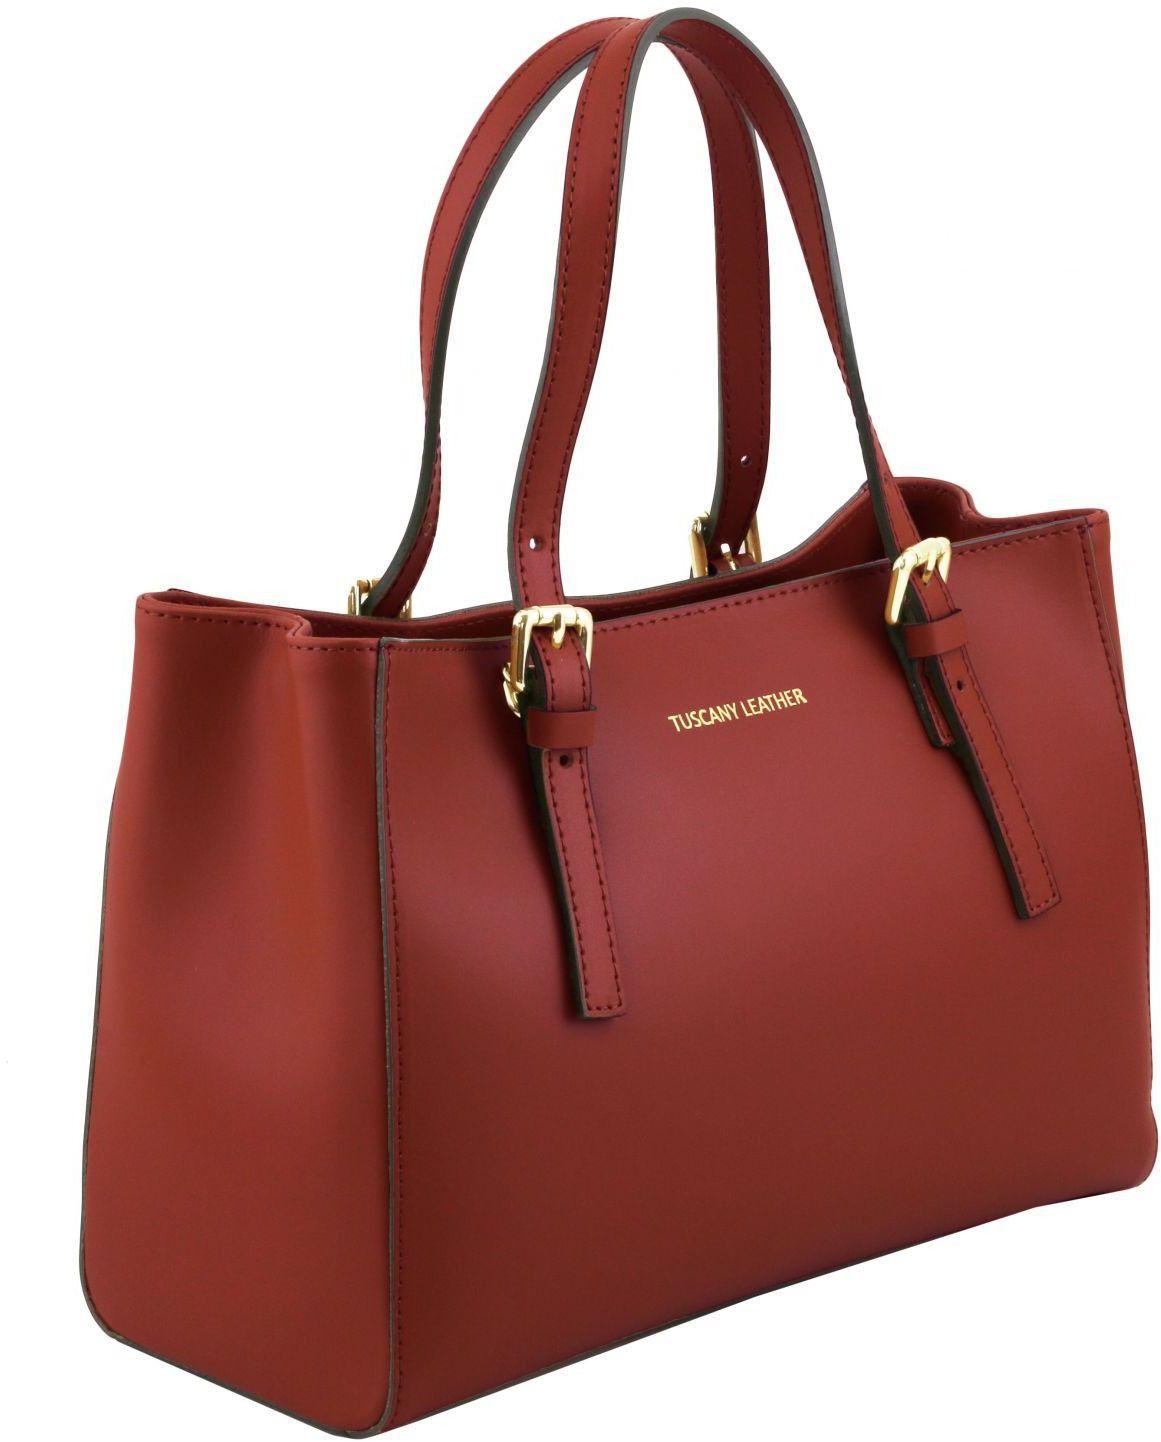 7fdd91c546 Γυναικεία Τσάντα Δερμάτινη Aura Κόκκινο Tuscany Leather